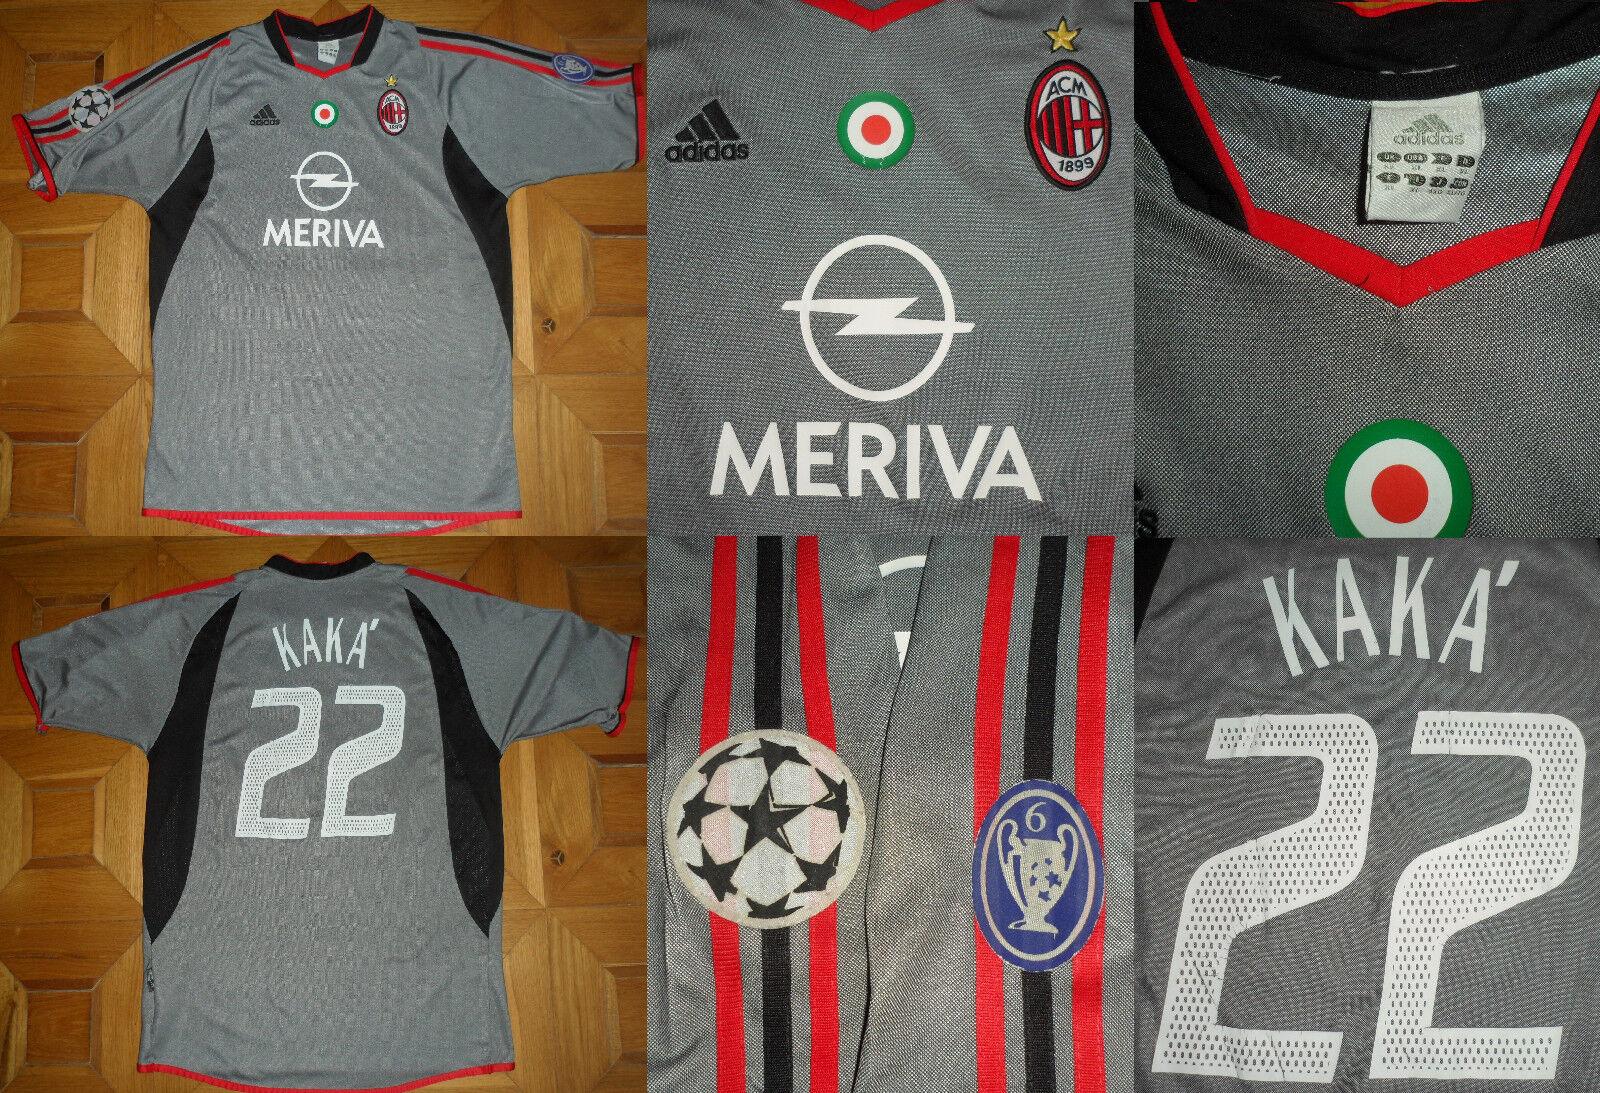 Maglia shirt jersey MILAN KAKA' OPEL ADIDAS 20032004